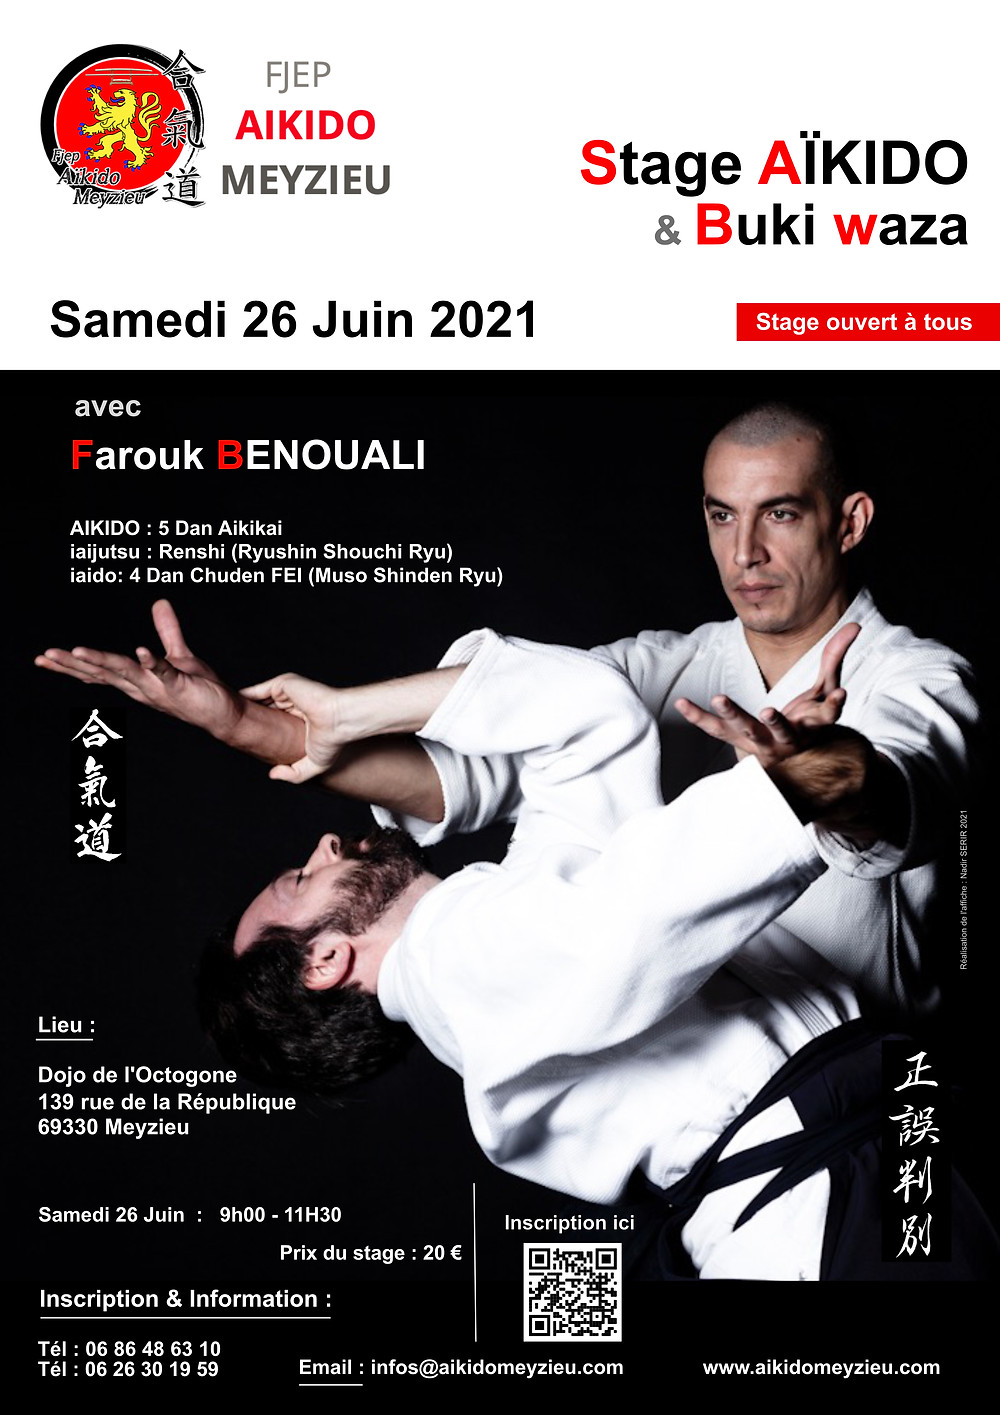 Affiche Stage Samedi 26 Juin 2021 de 9h00 à 11h30 avec Farouk BENOUALI